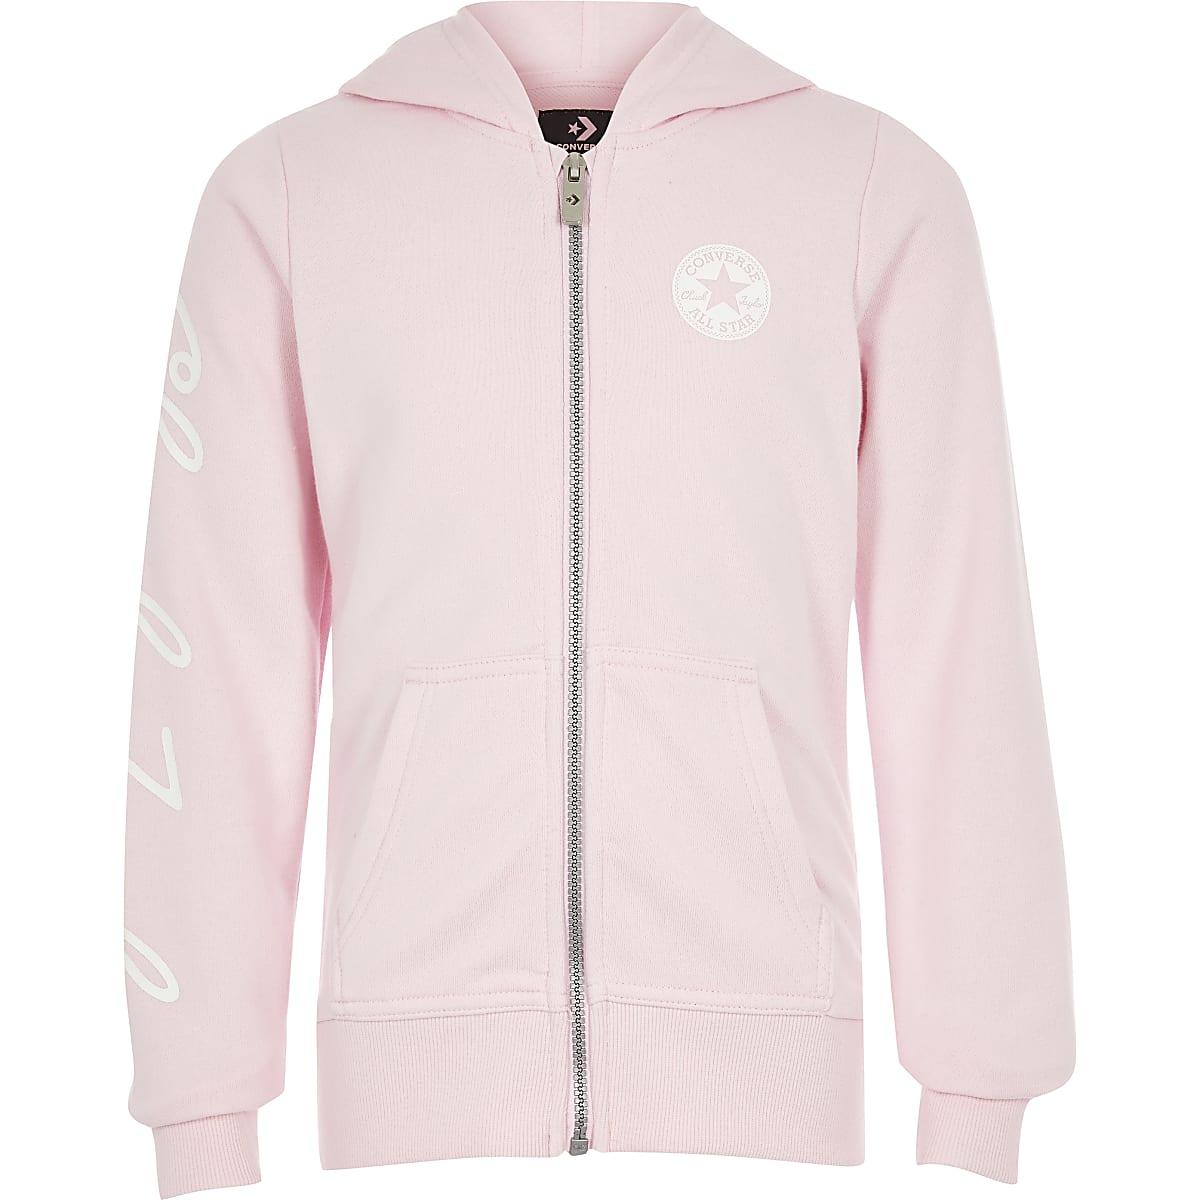 Girls Converse pink zip through sweatshirt